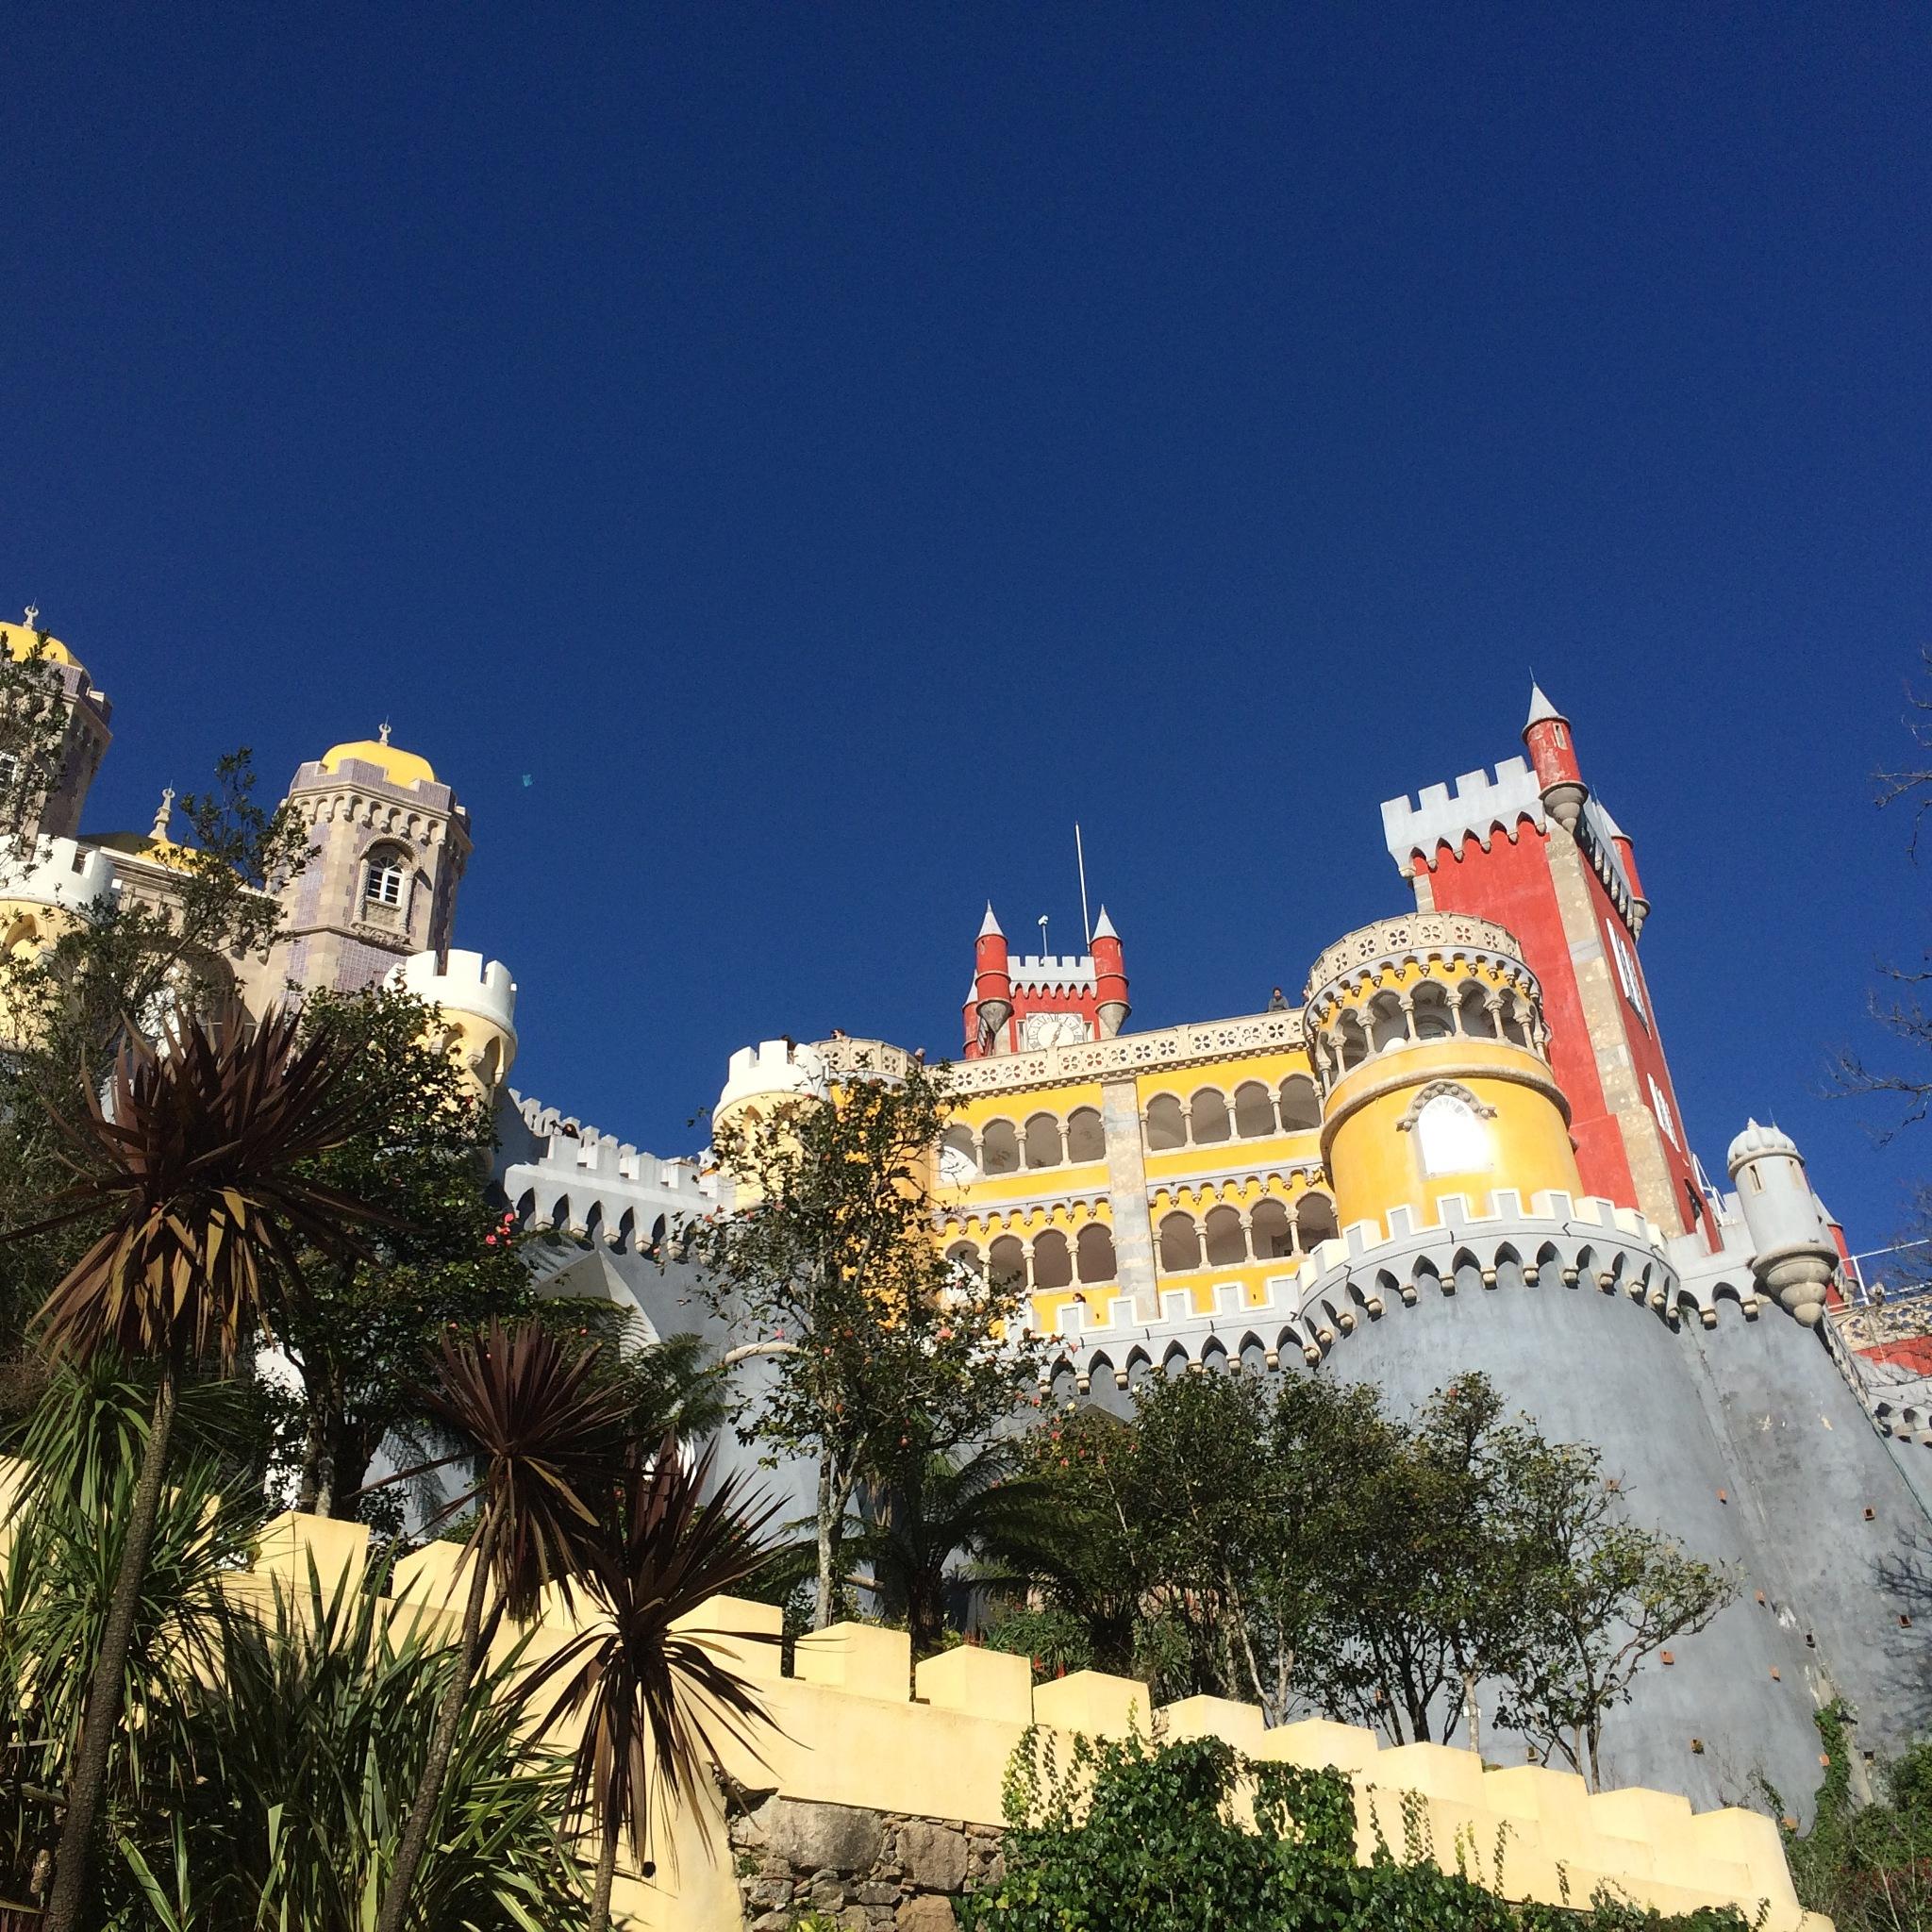 Peña Castle - Sintra - Portugal by Leonardo Perin Vichi